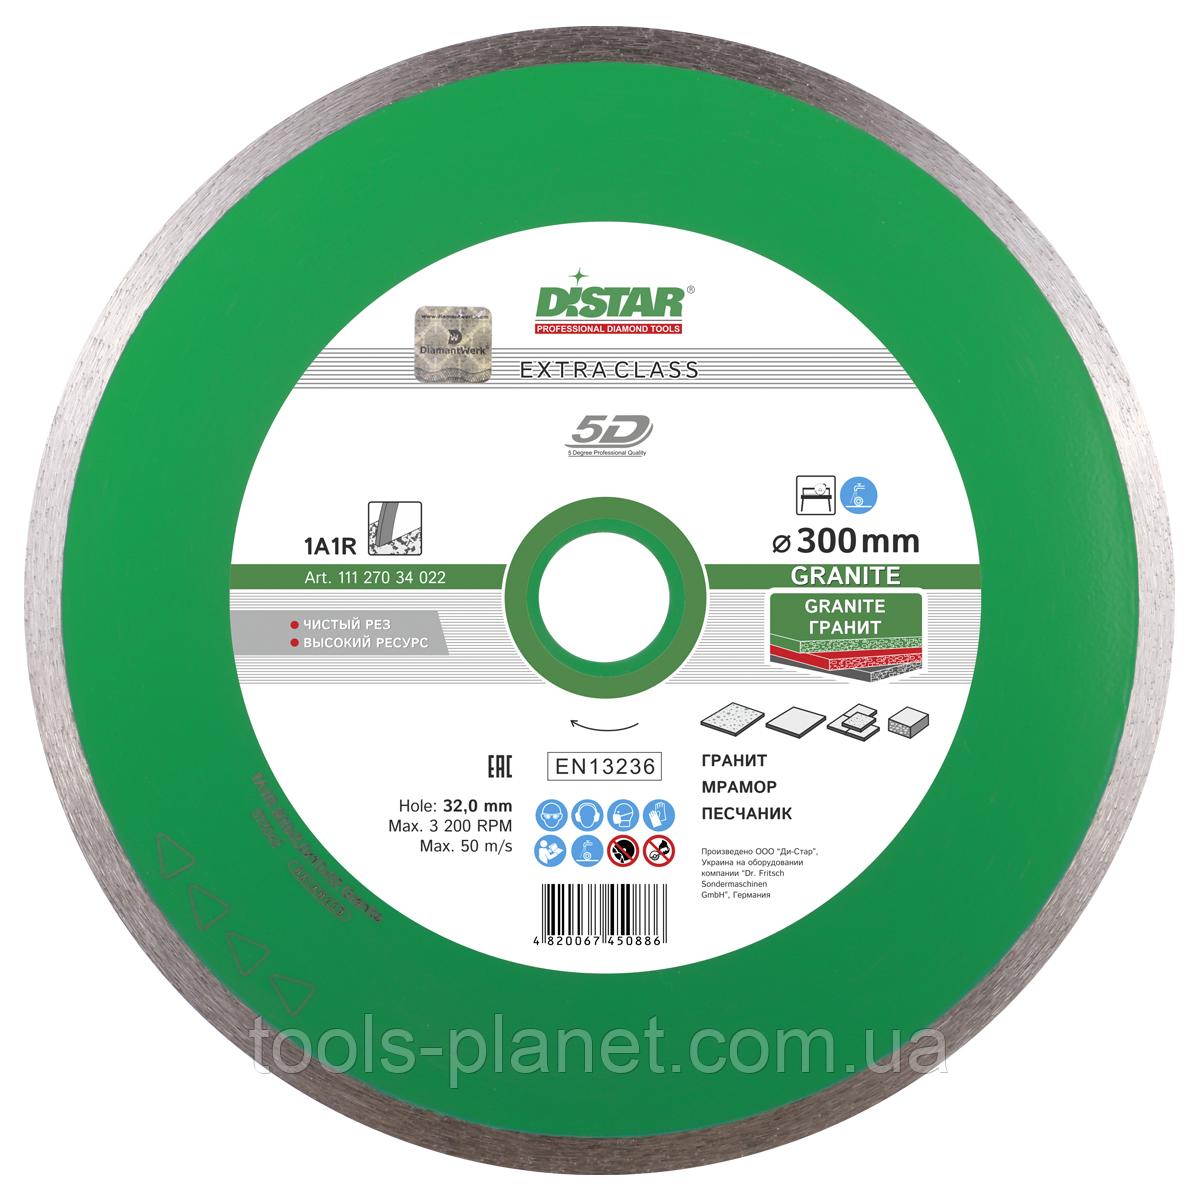 Алмазный диск Distar 1A1R 300 x 2,0 x 10 x 32 Granite 5D (11127034022)